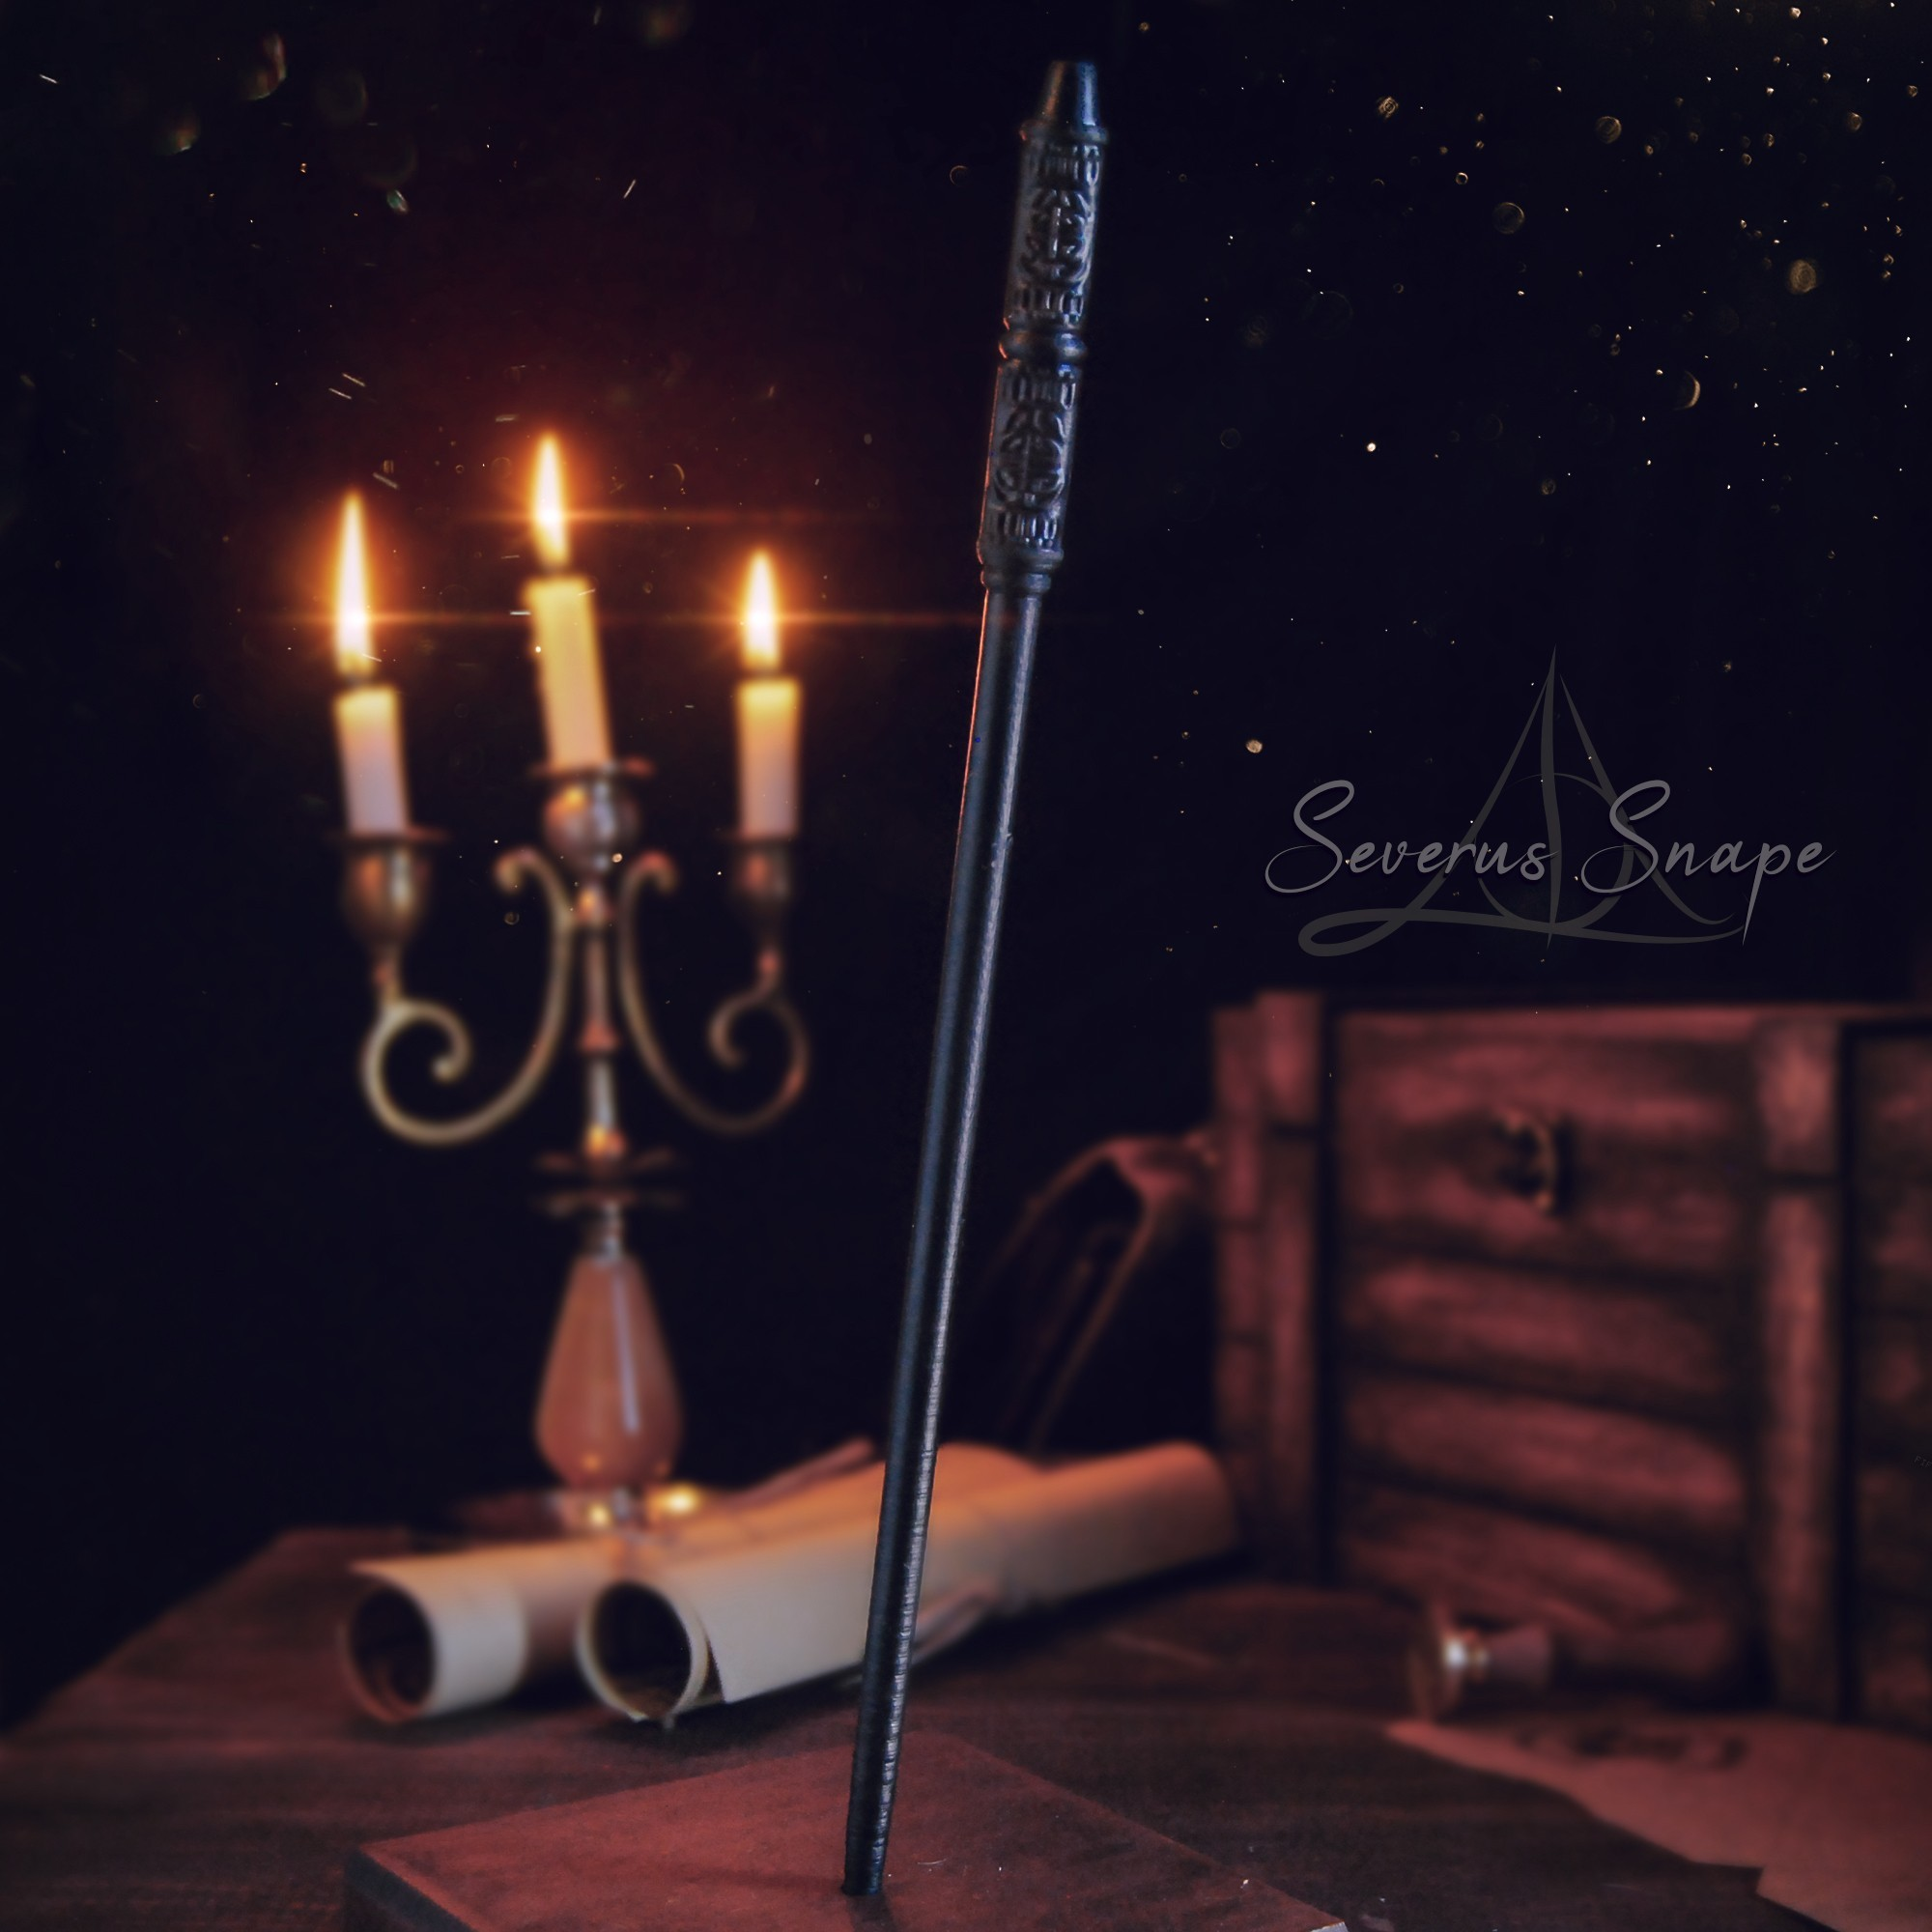 Severus Snape.jpg Download 3DS file SEVERUS SNAPE WAND - HARRY POTTER • 3D printable model, tolgaaxu